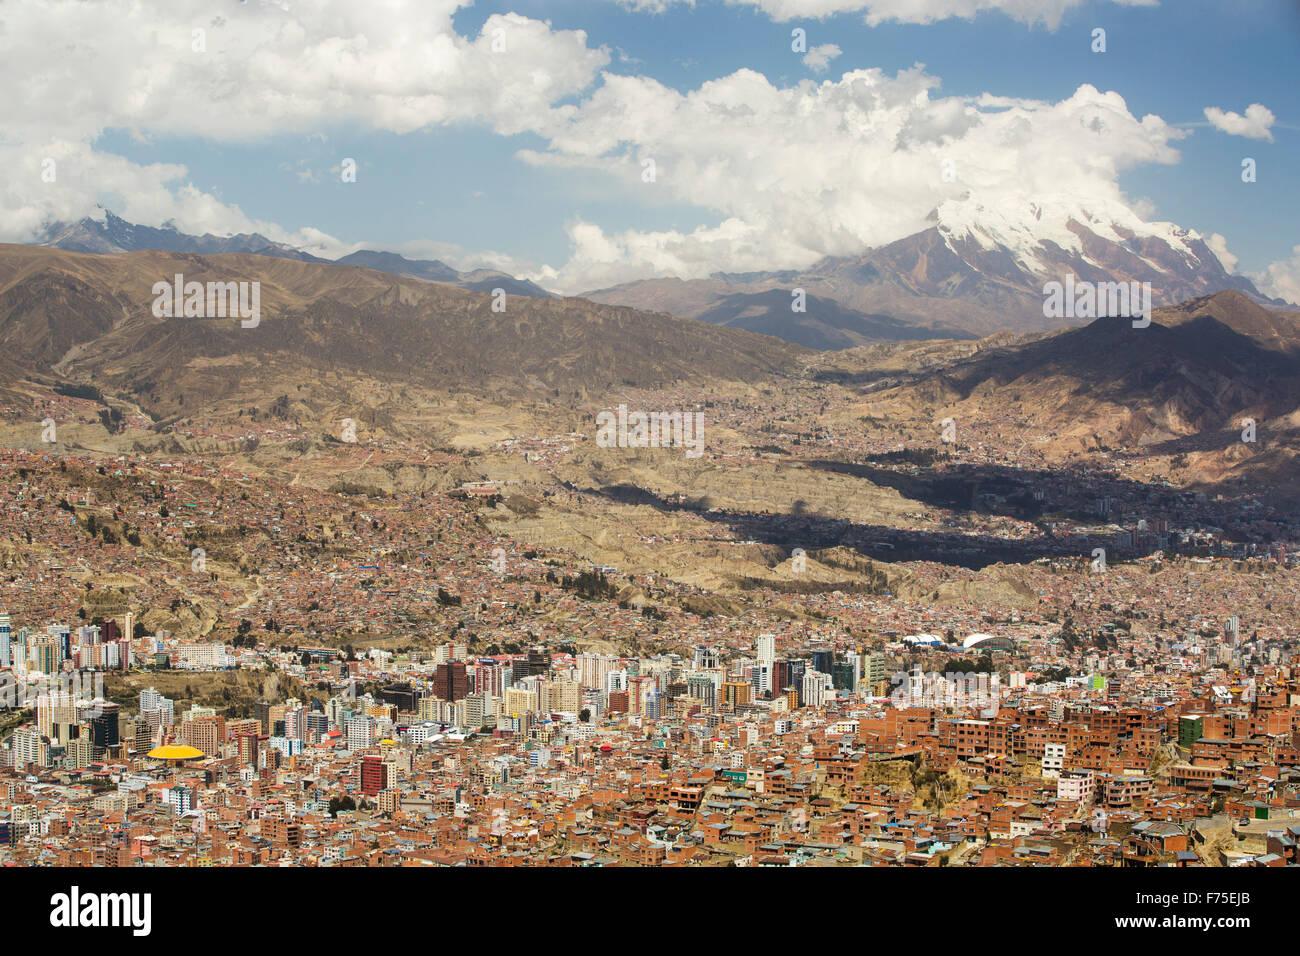 The peak of Illimani (6348 metres) from El Alto above, La Paz, Bolivia. La Paz and El Alto are critically short - Stock Image